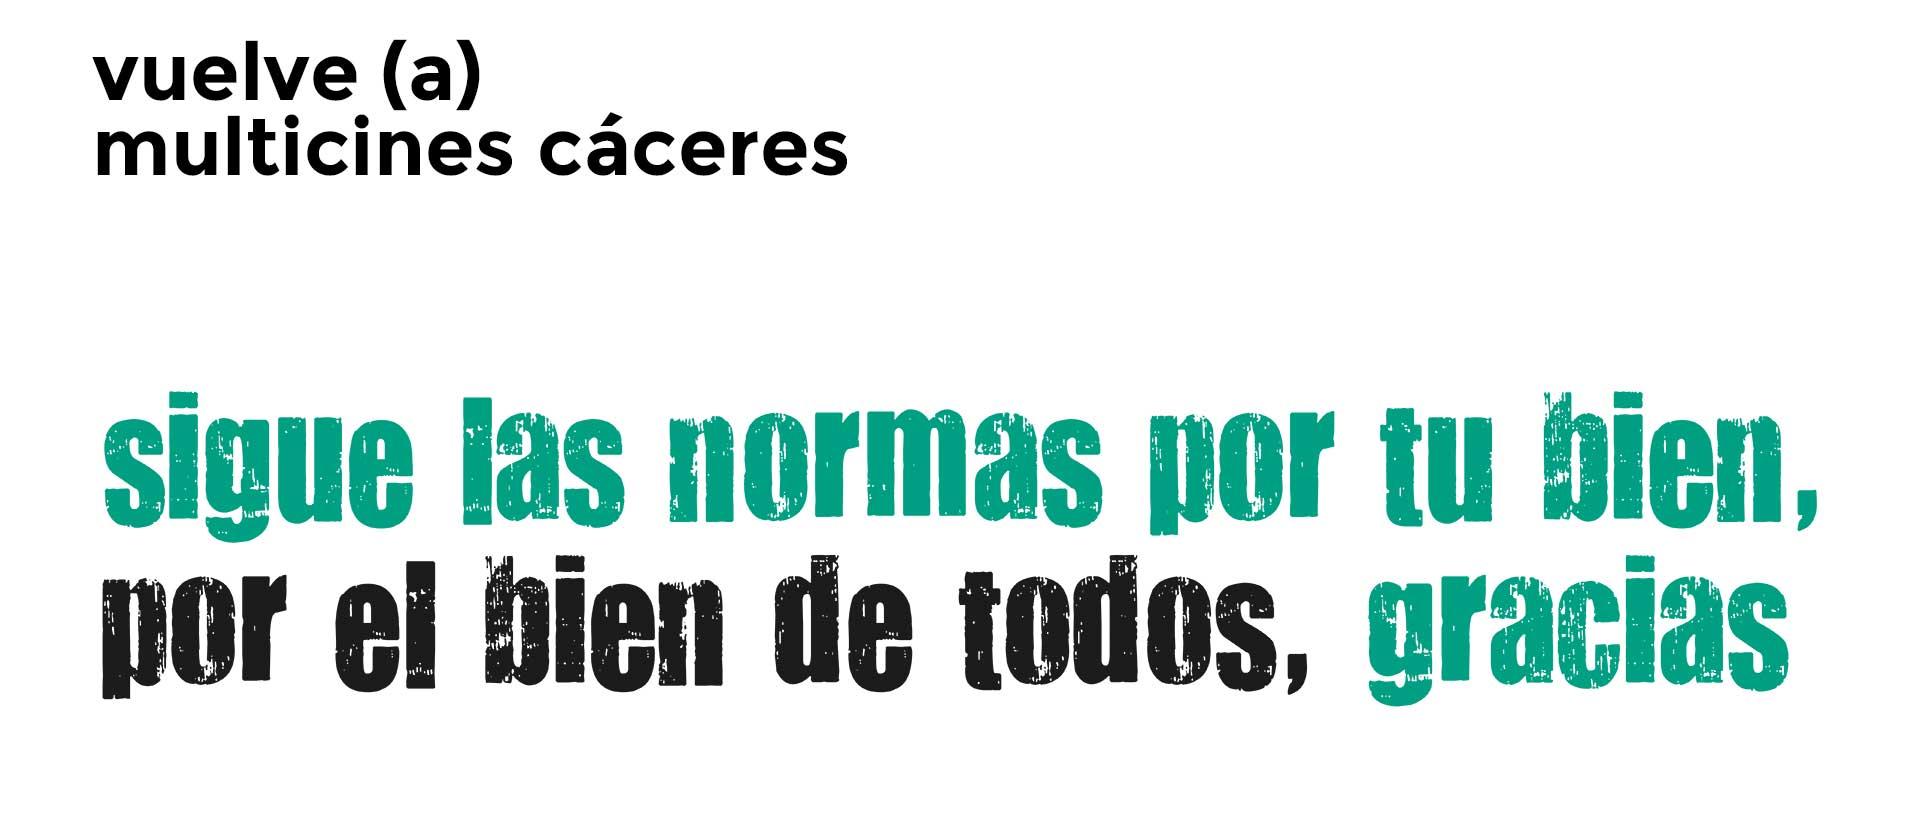 Caceres_portada_1920x818_02.jpg